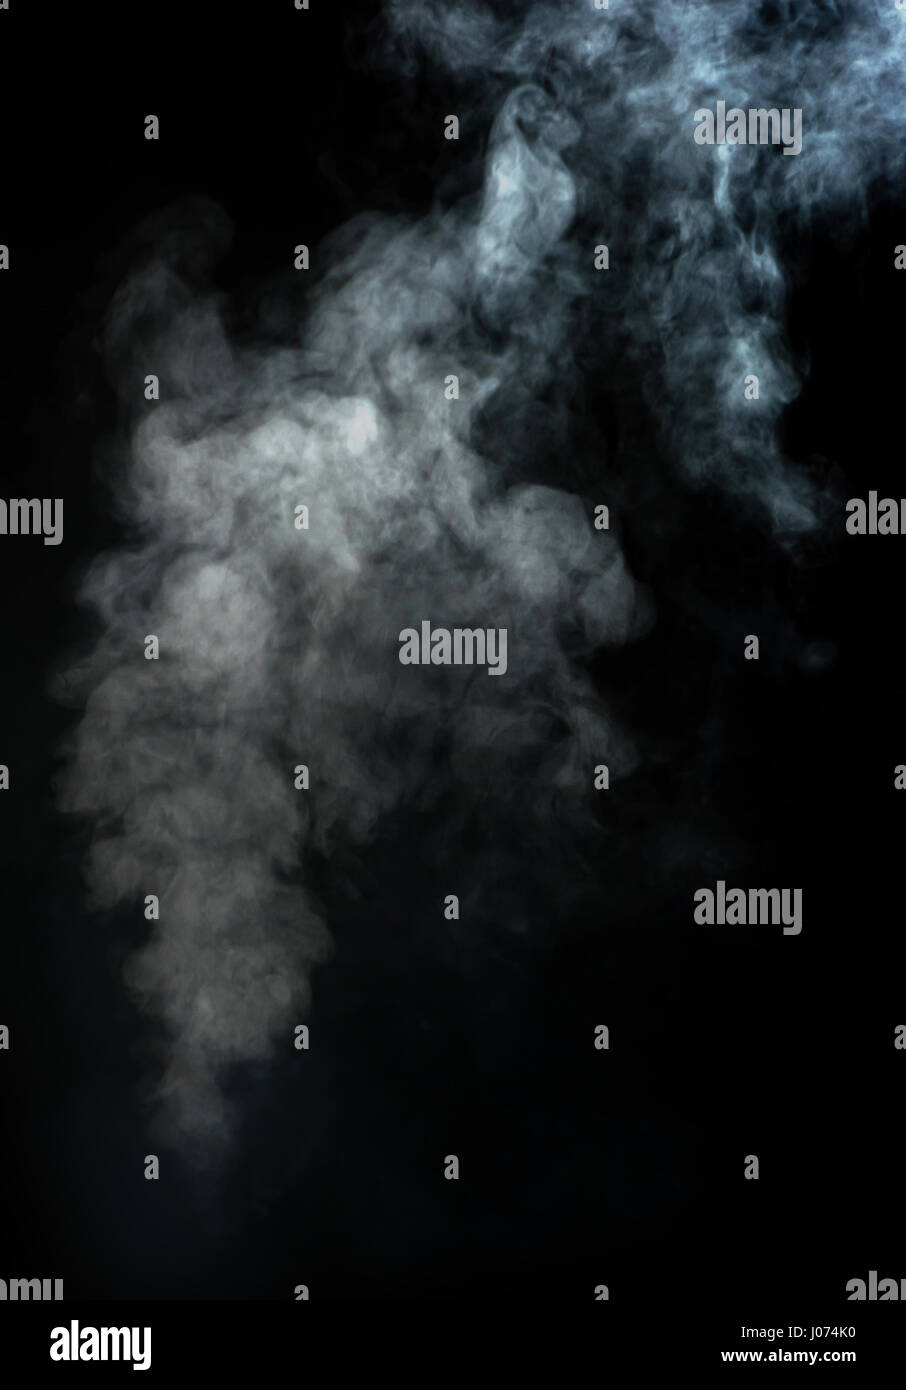 Abstract white smoke on black background - Stock Image